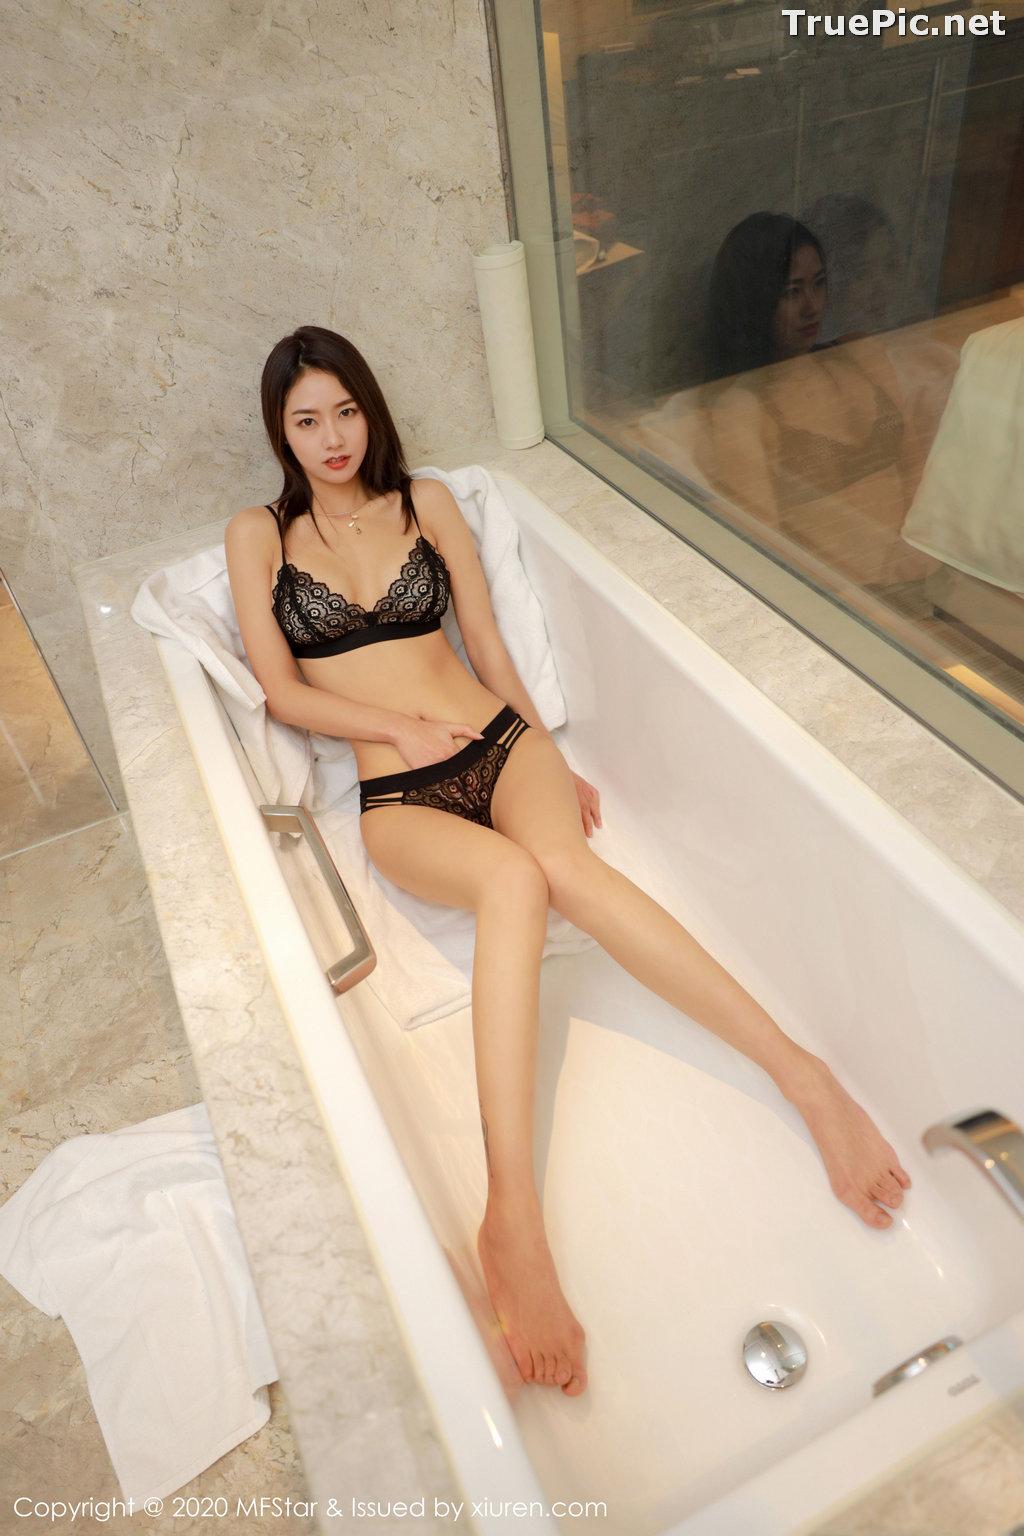 Image MFStar Vol.307 - Chinese Model - Fang Zi Xuan (方子萱) - TruePic.net - Picture-4